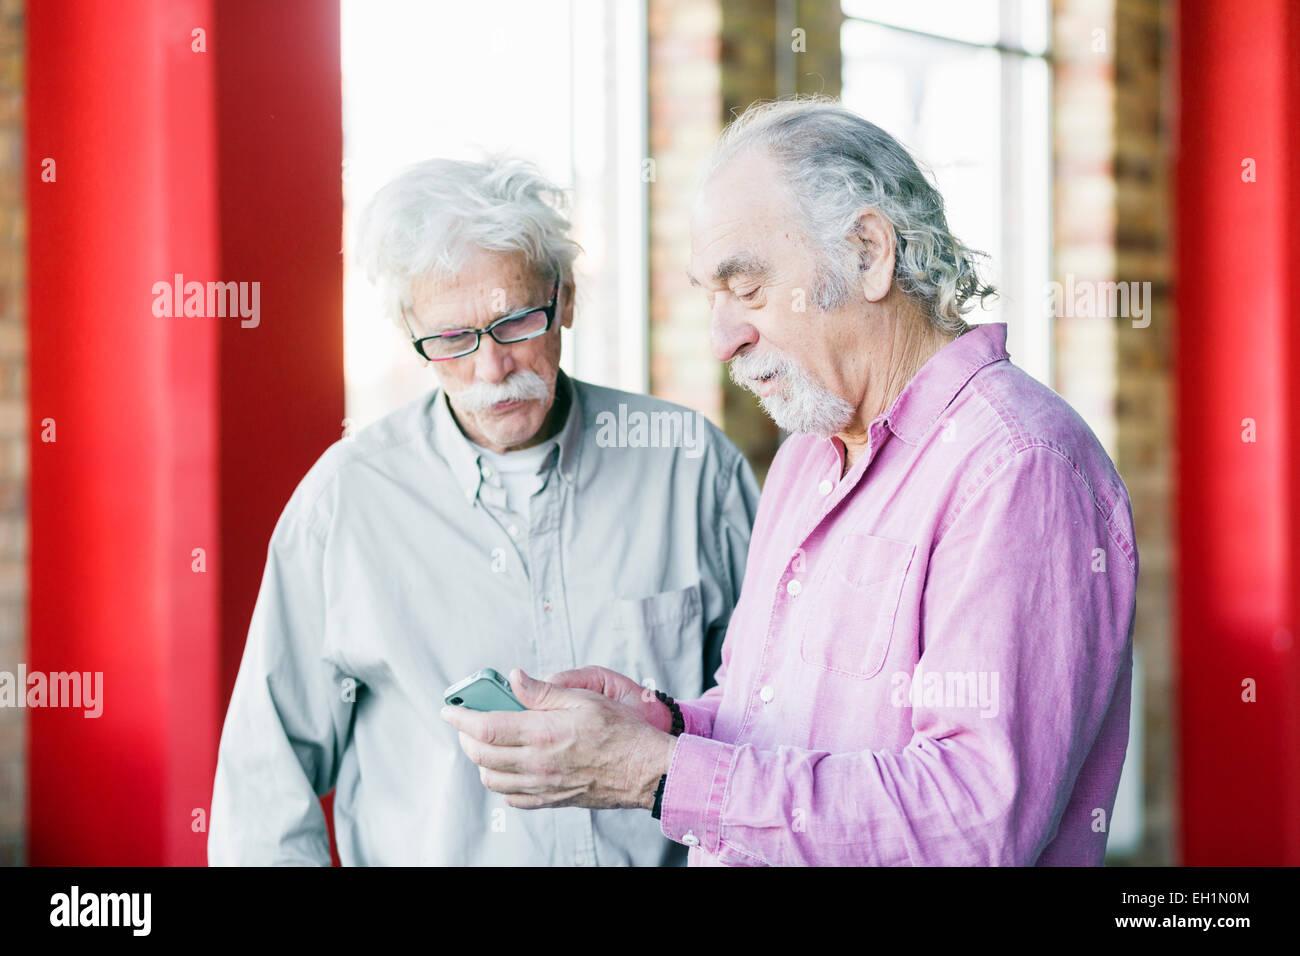 Senior men using mobile phone in gym - Stock Image